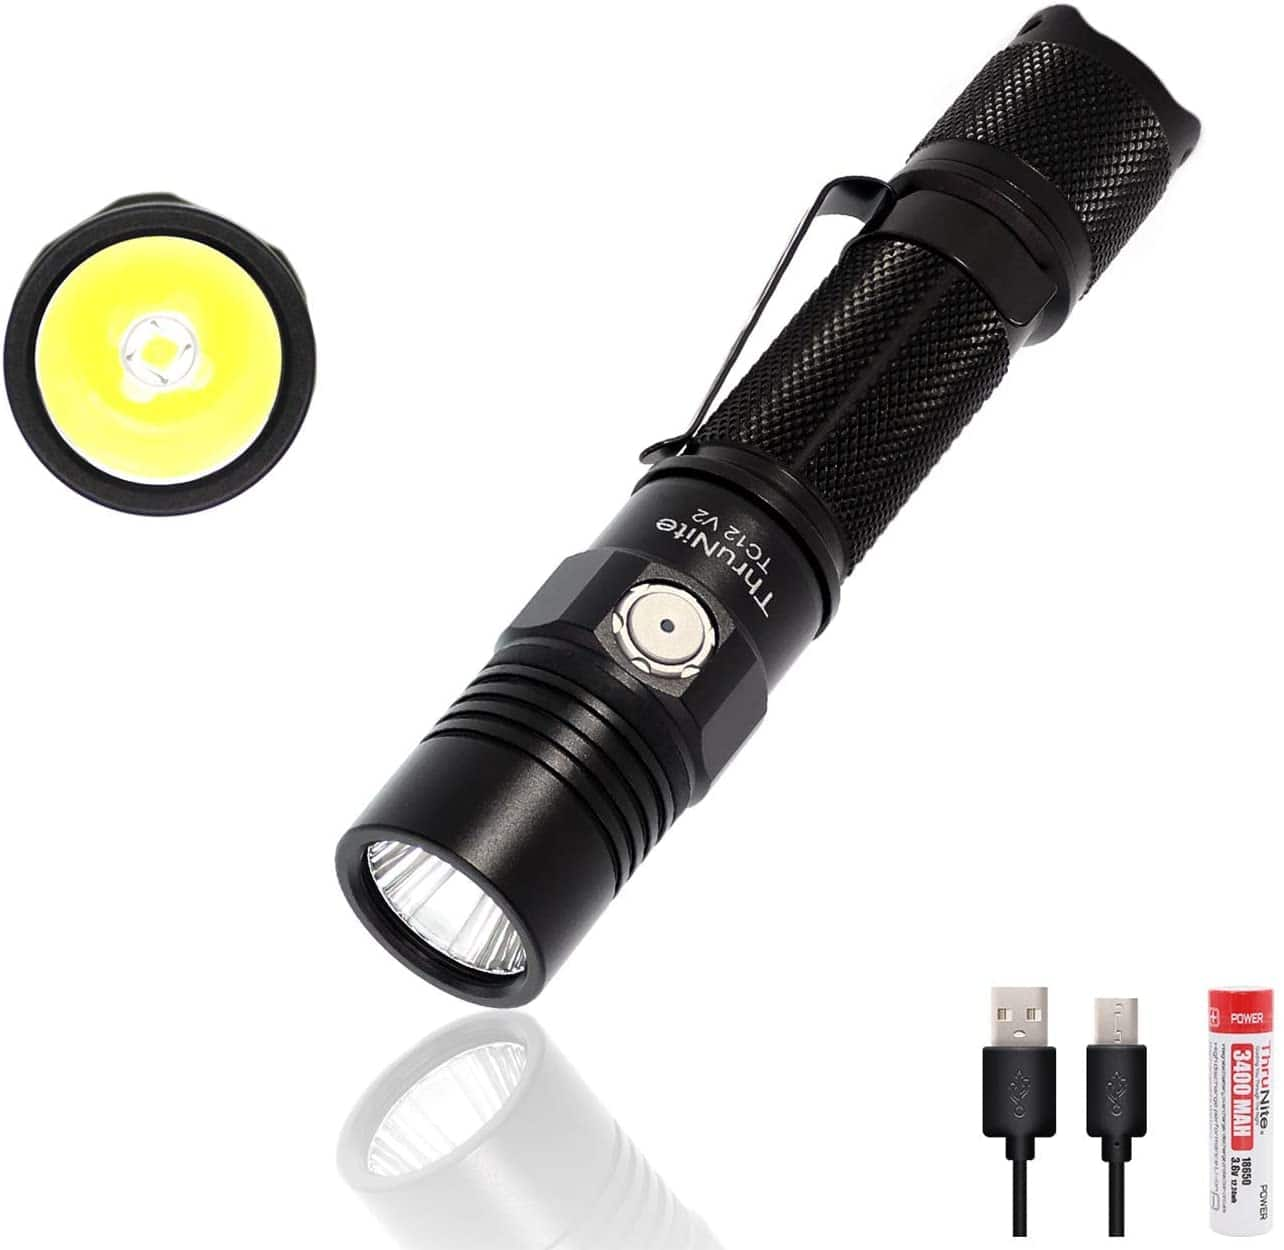 ThruNite TC12 V2 LED (CREE XP-L) Flashlight with Micro-USB Charging 18650 Battery - $40 AC